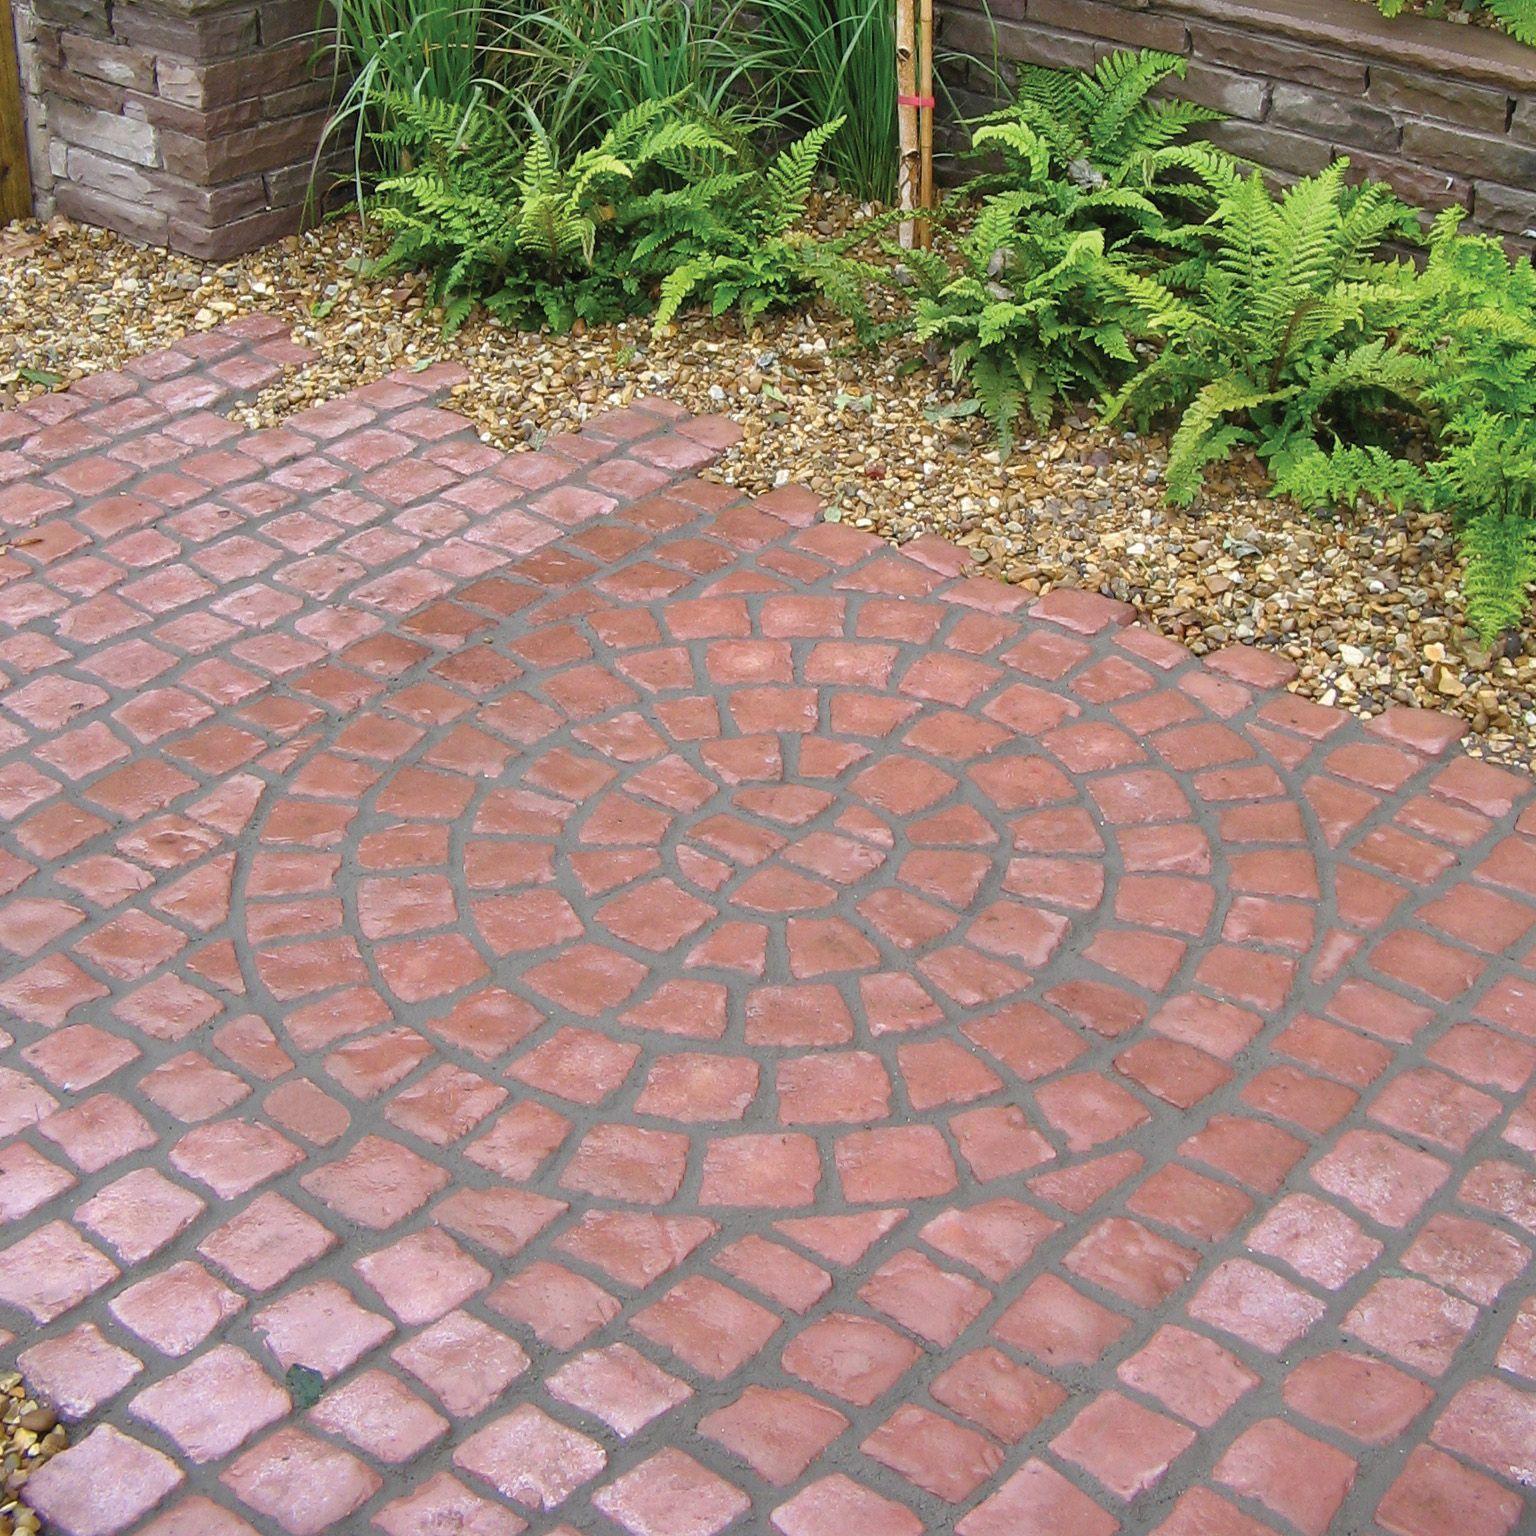 Rustic Red Carpet Stones Cobble Mat Full Circle In Square L 1200mm W 600mm Departments Diy At B Amp Patio Garden Design Small Patio Design Garden Paving